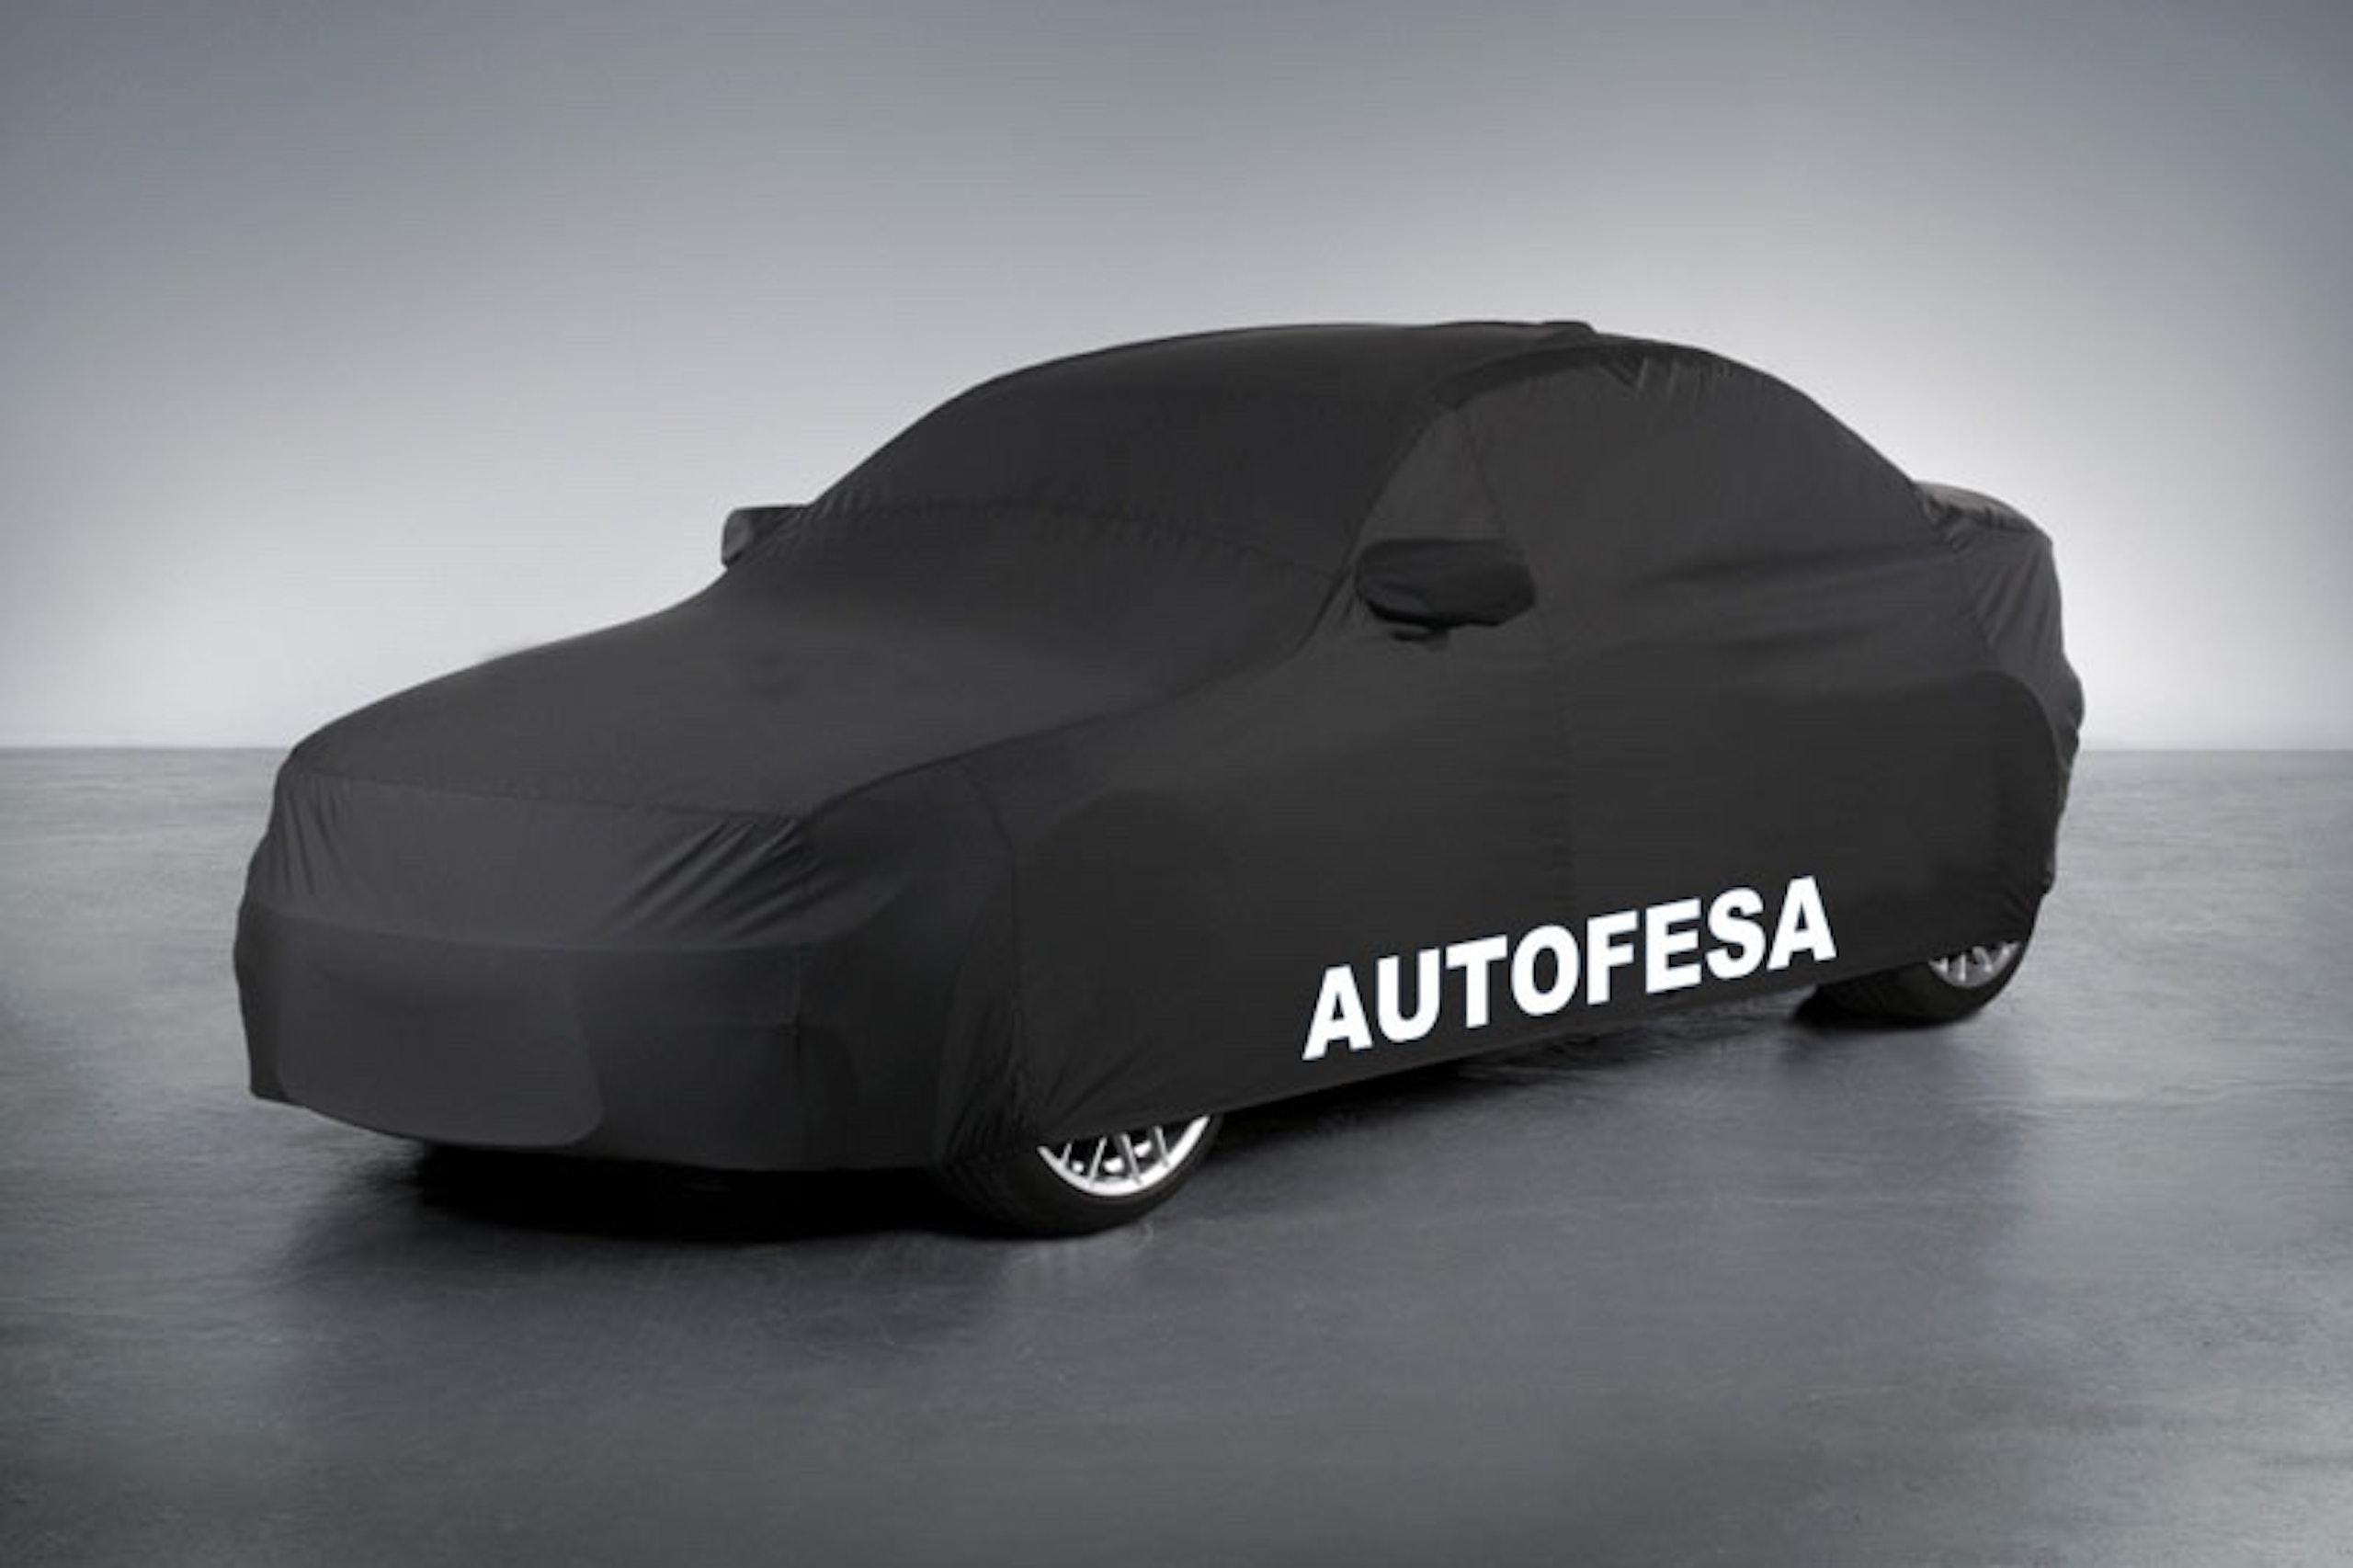 Fotos del Audi Q2 2.0 TDI 150cv Quattro Auto 5p S/S Exterior 1